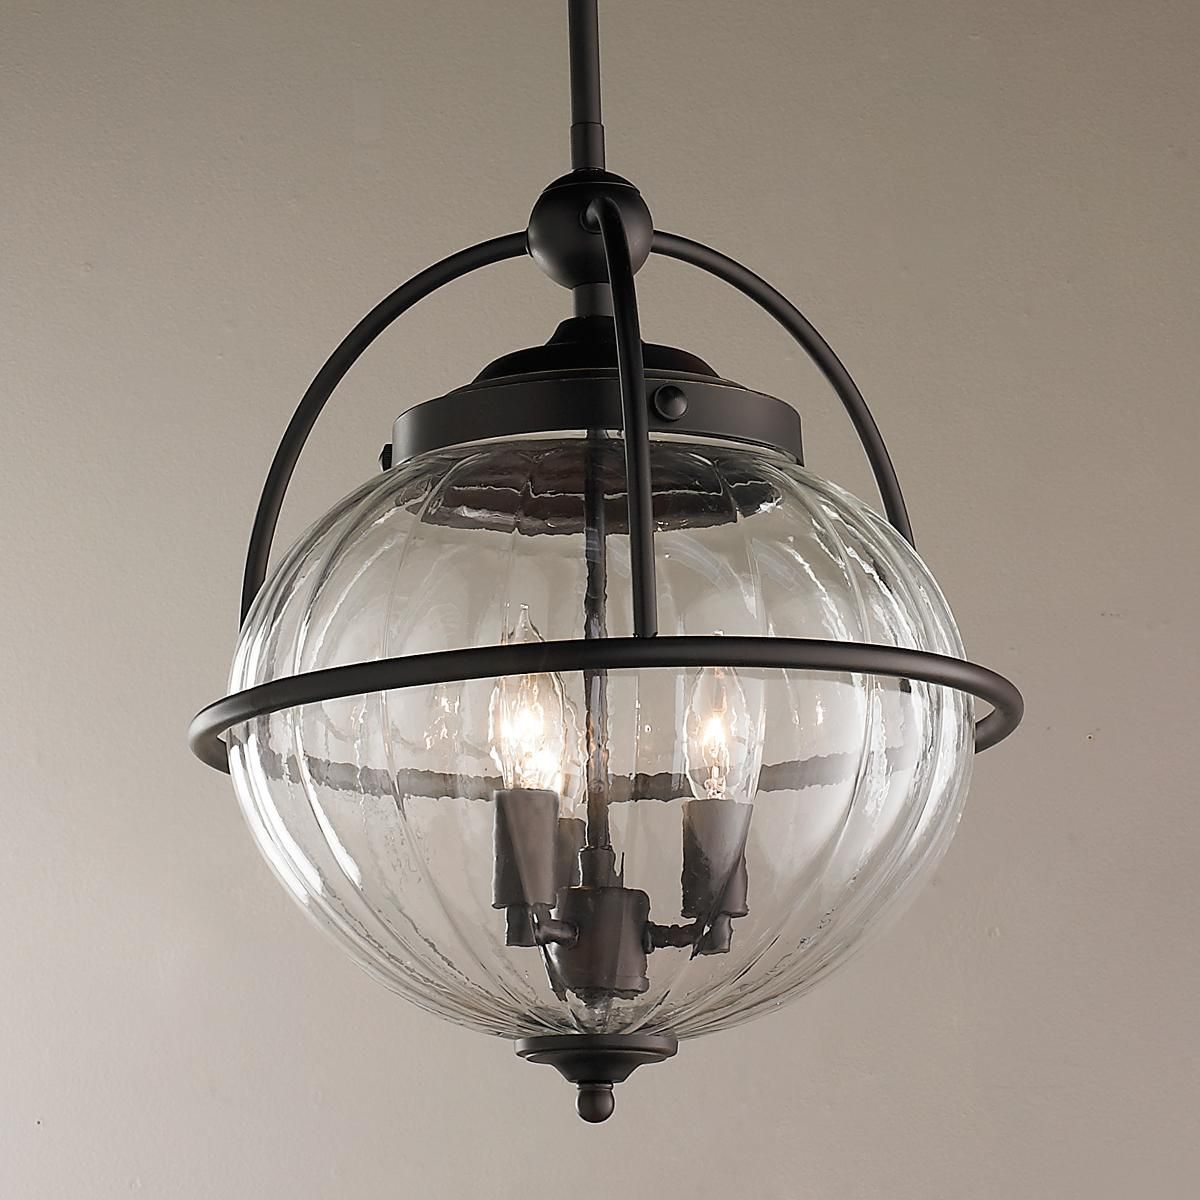 Nautical Light Fixtures Kitchen: Nautical Lantern Style Pendant - Large